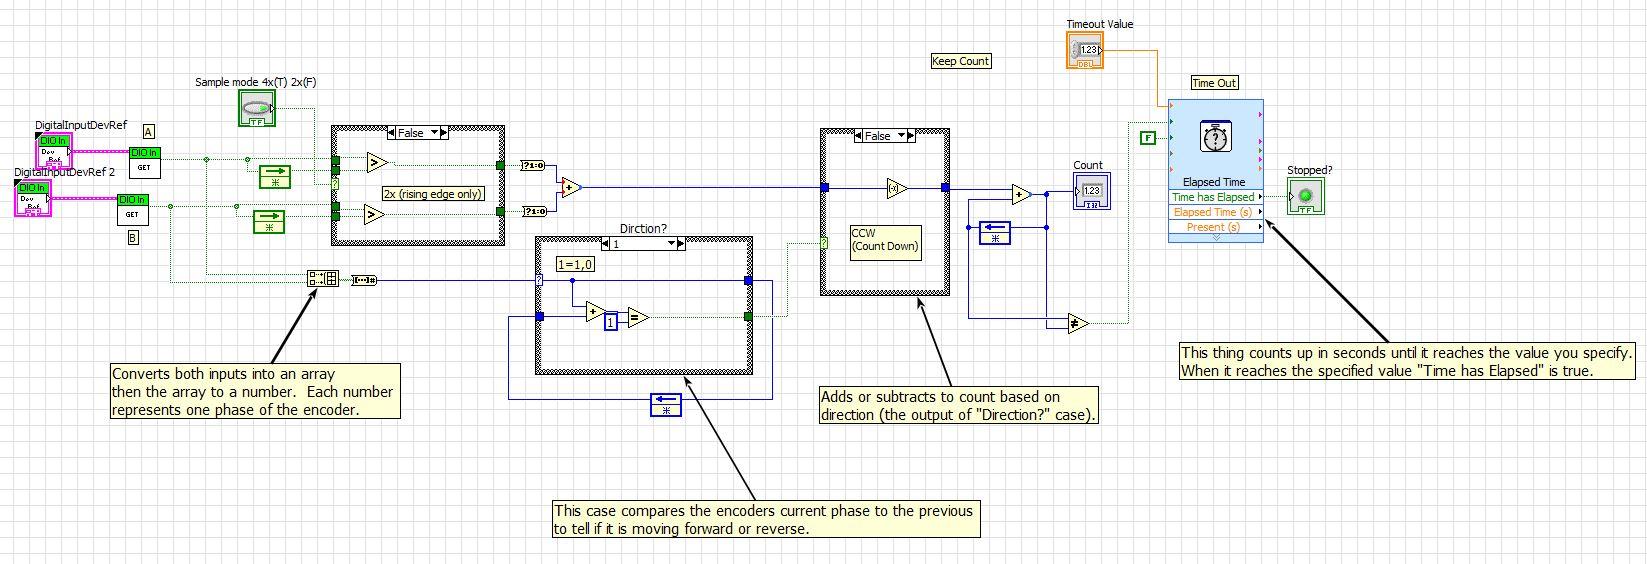 Coustom Quadrature Encoder VI - NI LabVIEW - Chief Delphi